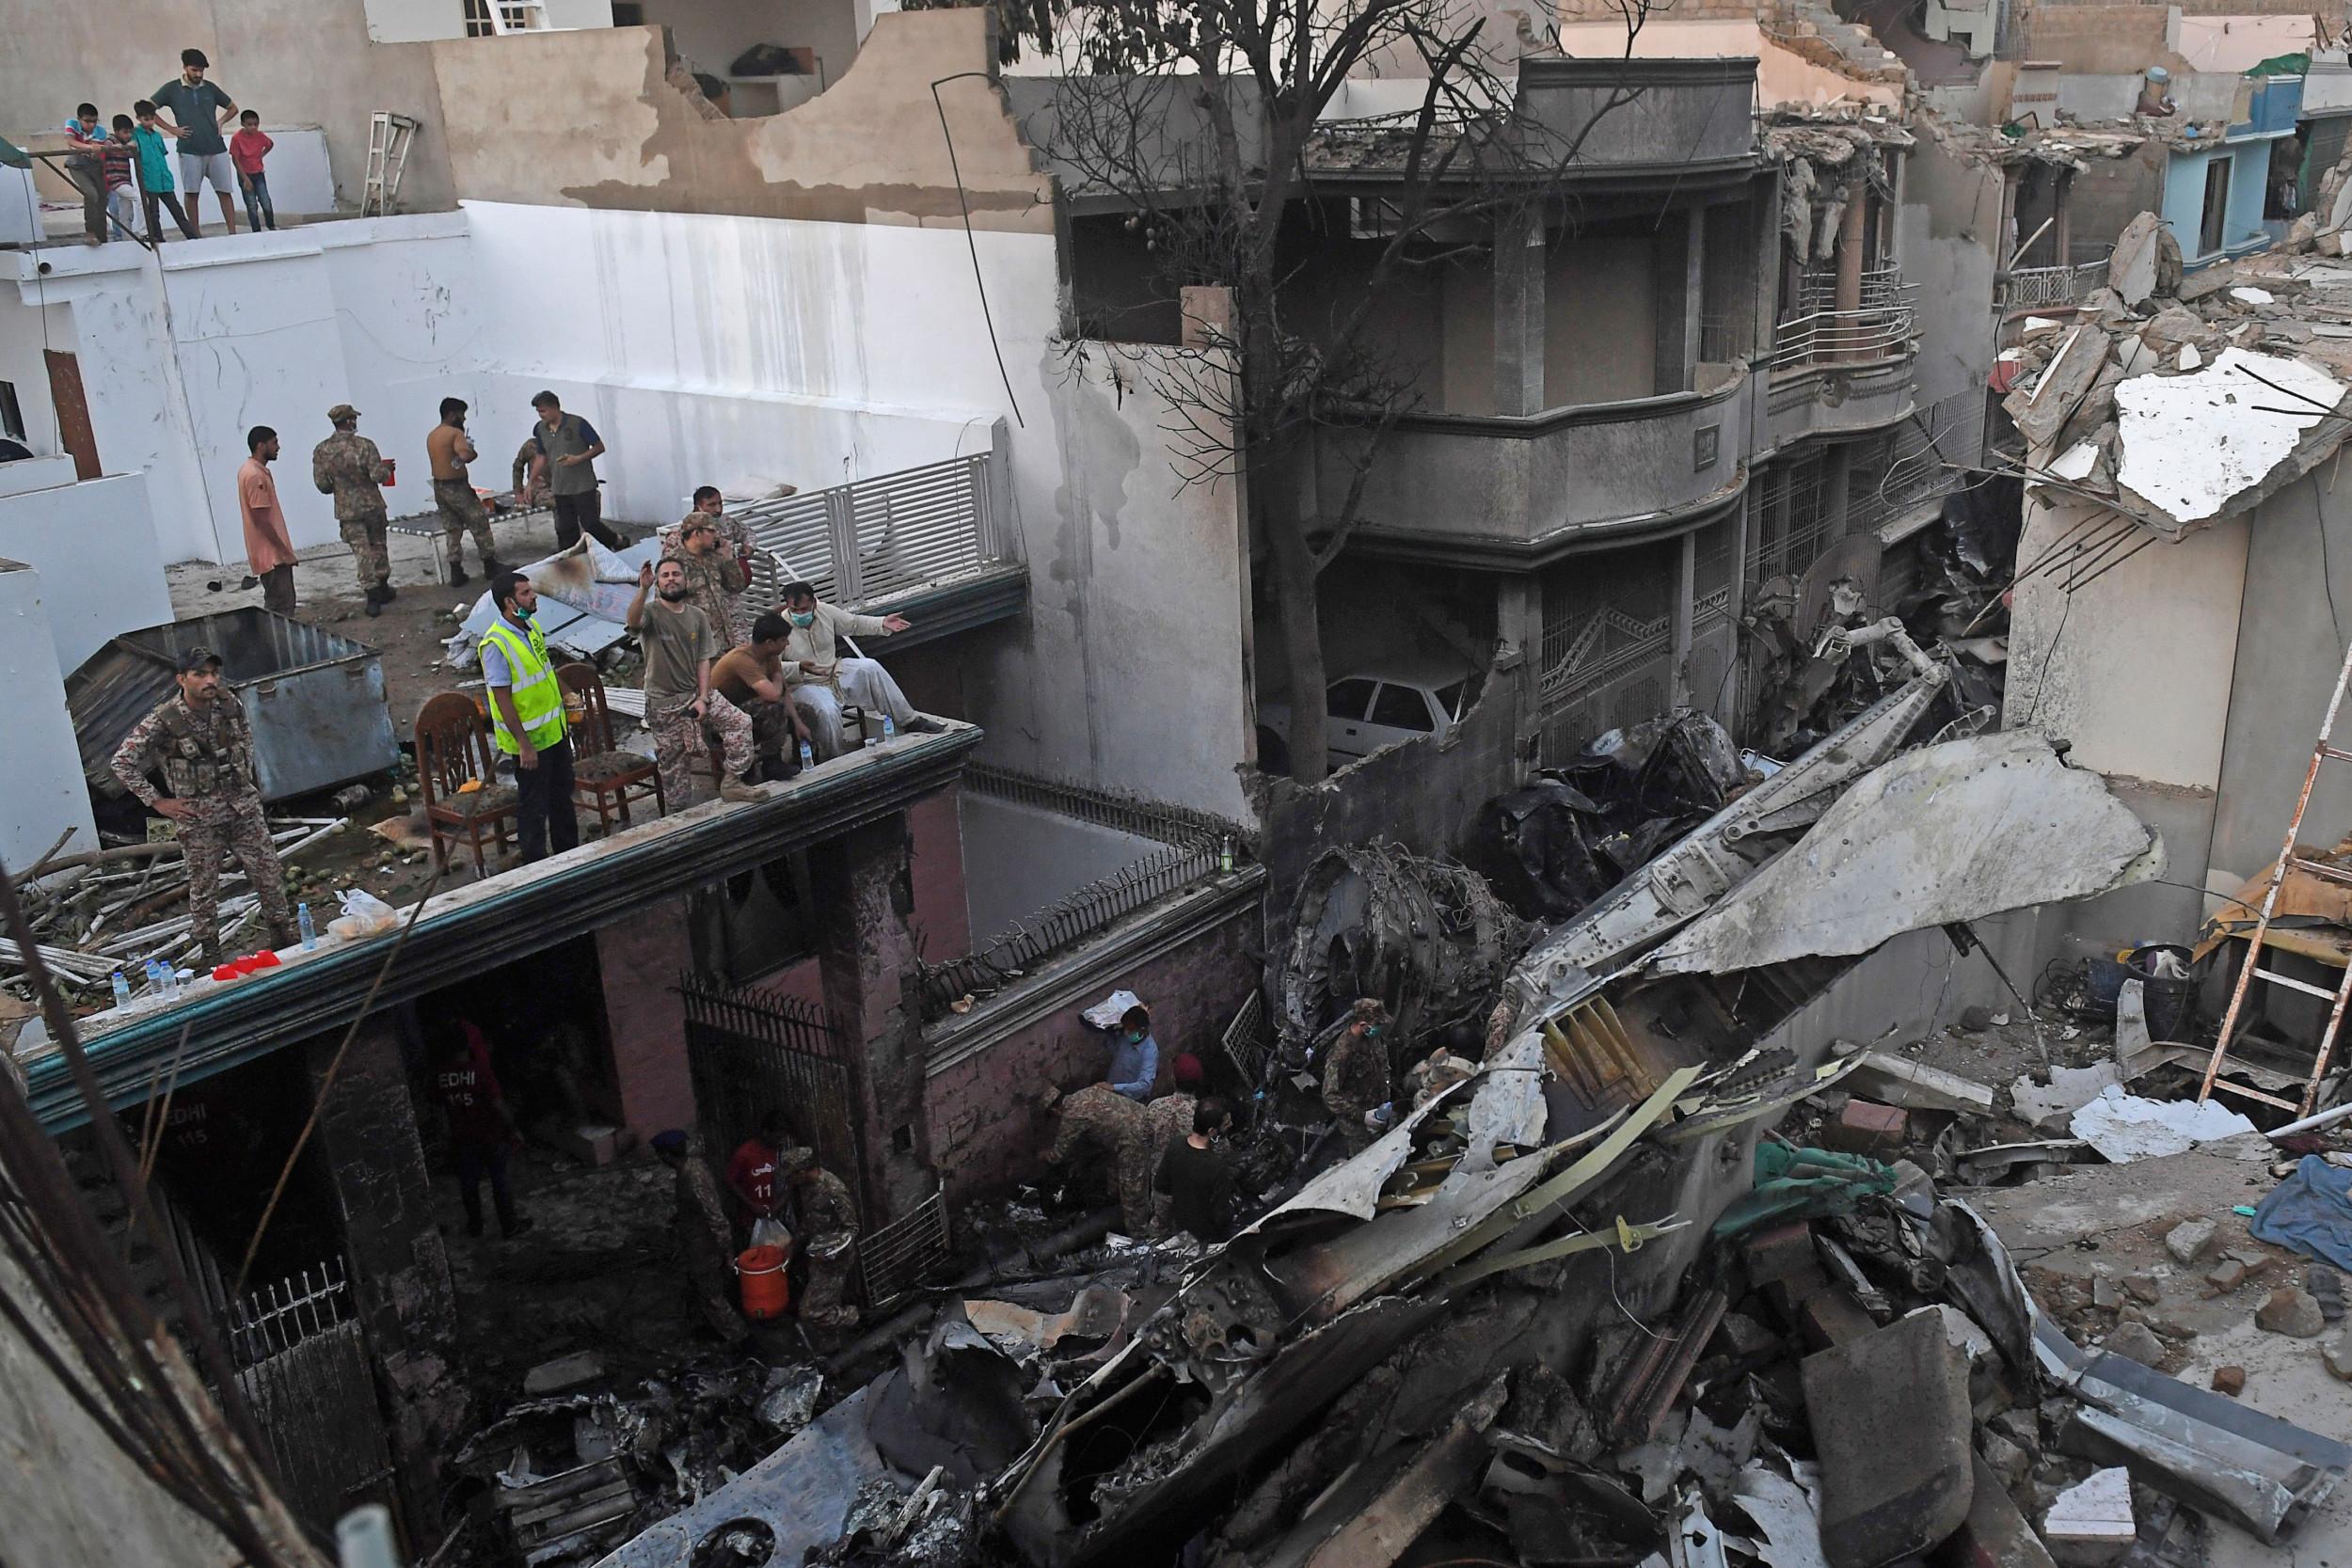 Survivor Of Pakistan Airline Crash Recalls Last Moments Of Doomed Flight I Heard People Crying Children Crying